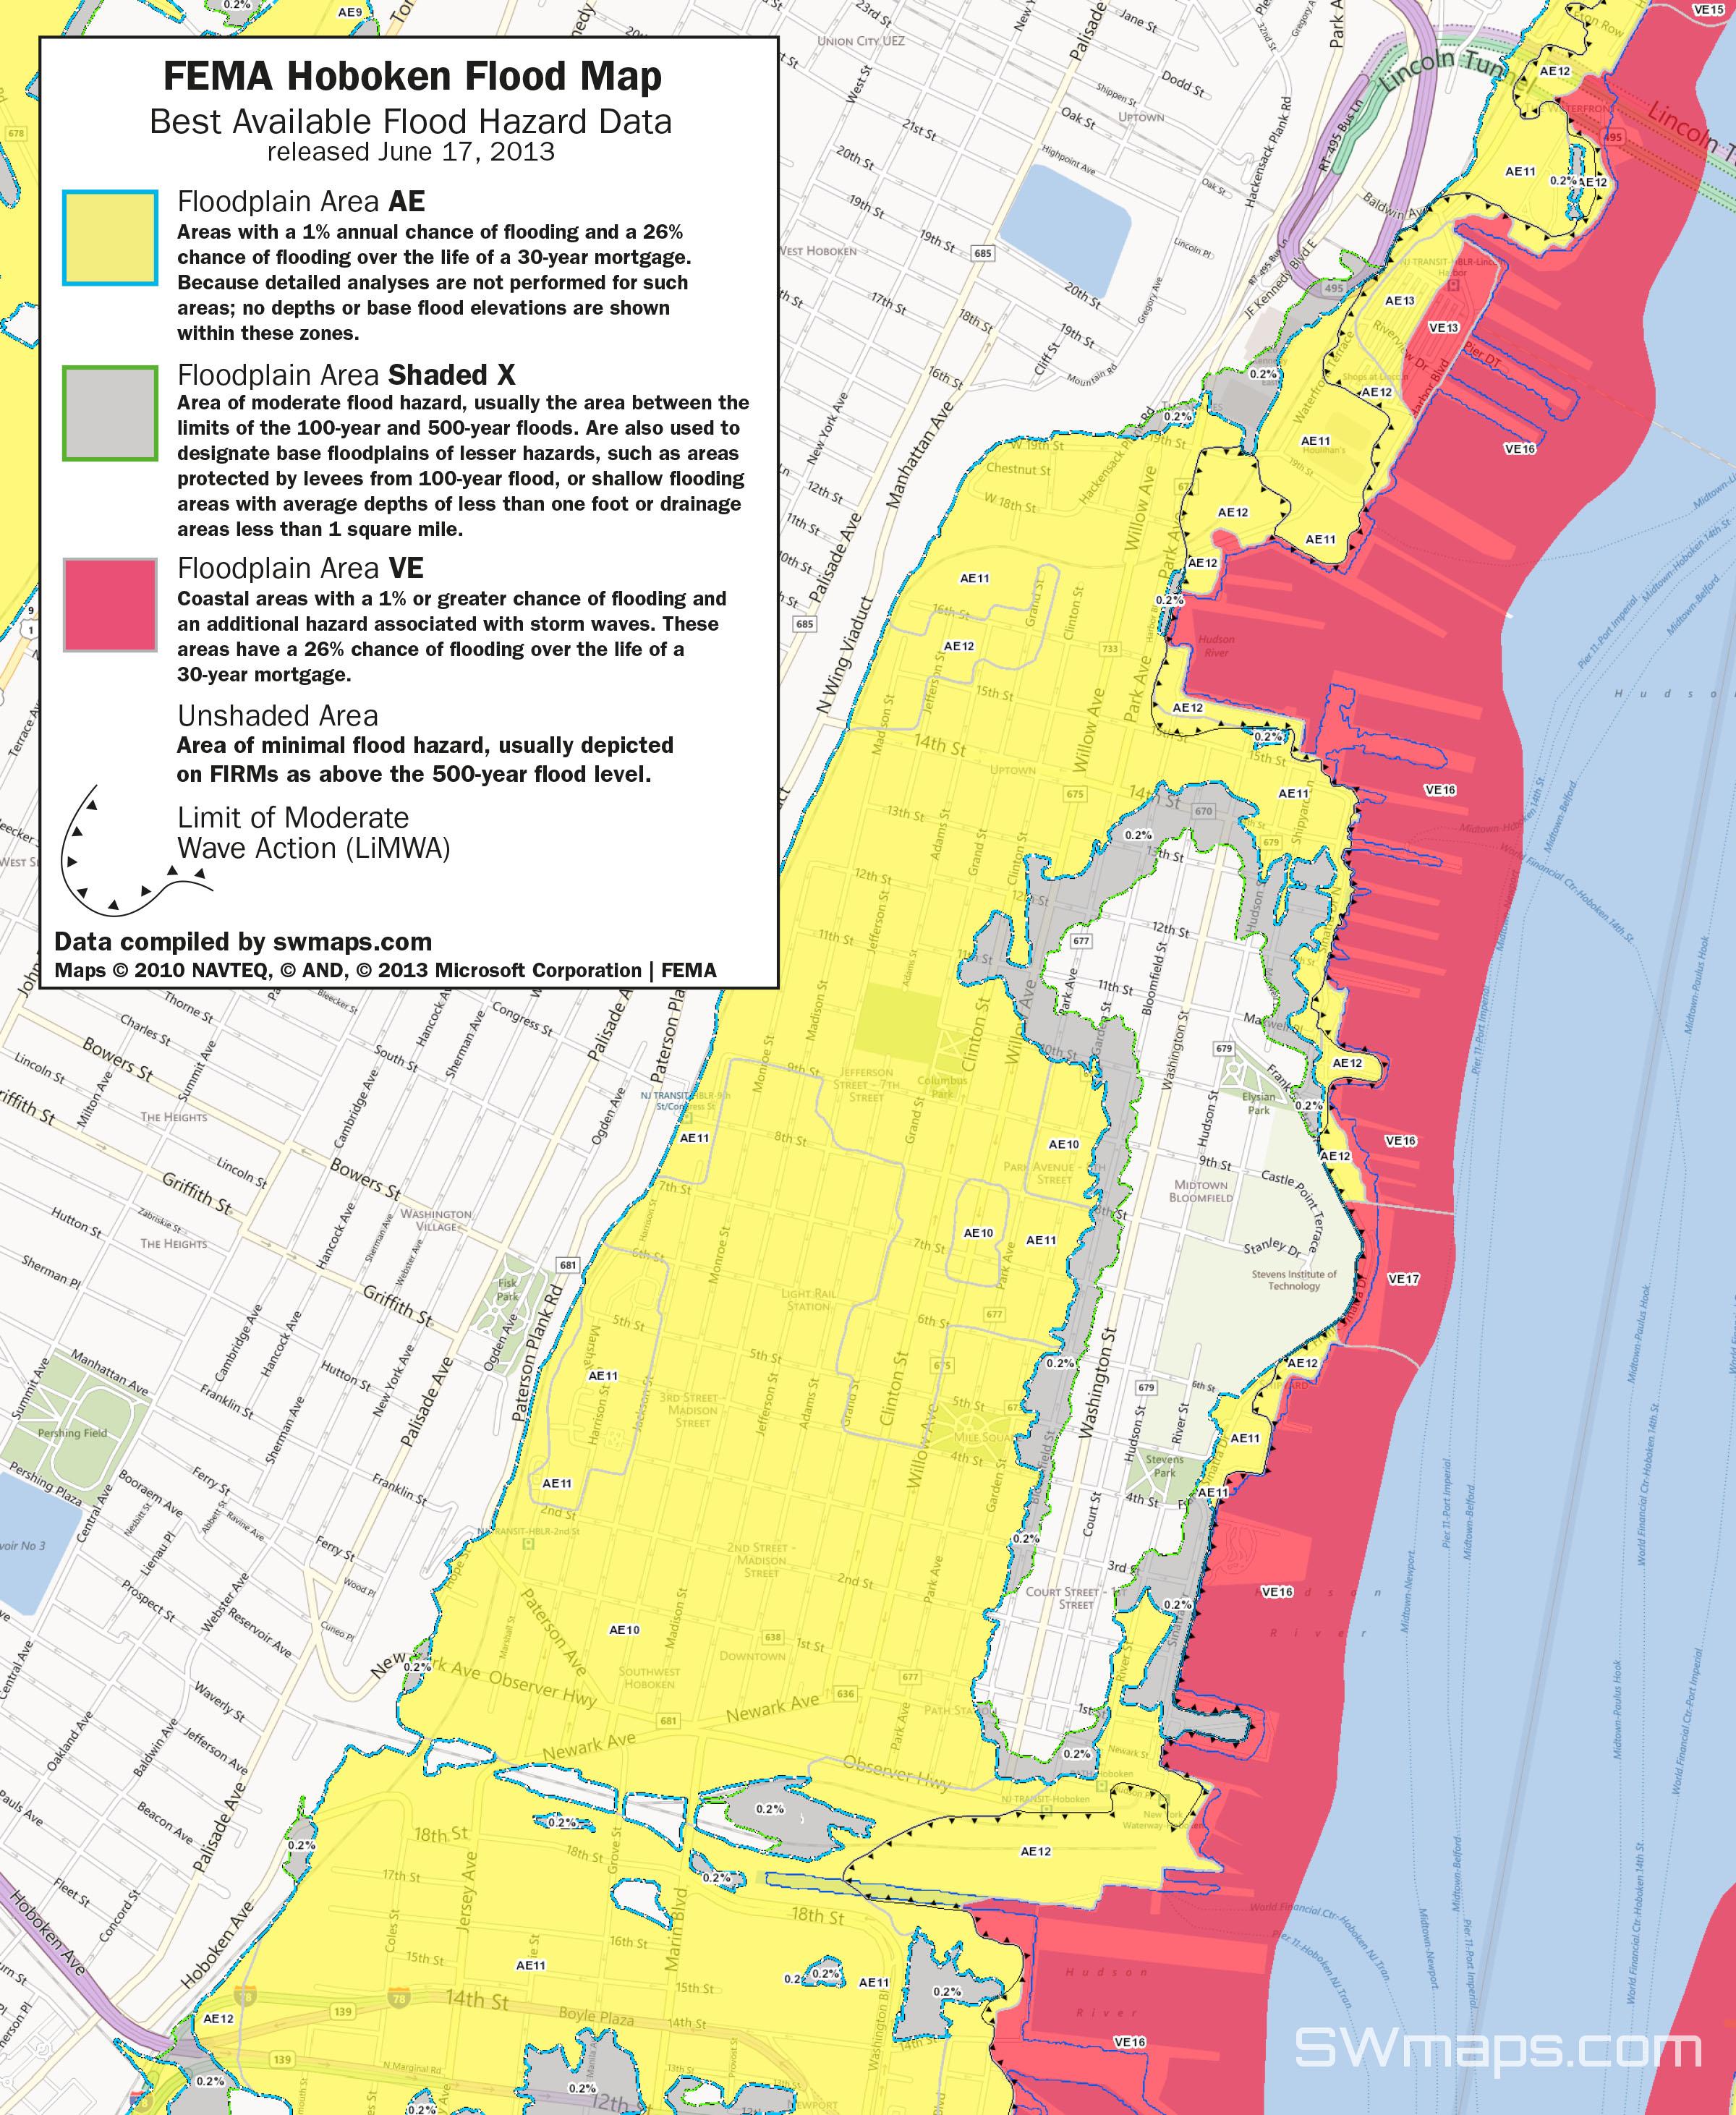 Florida Flood Zone Map - Fema Flood Zone Map Sarasota County Florida